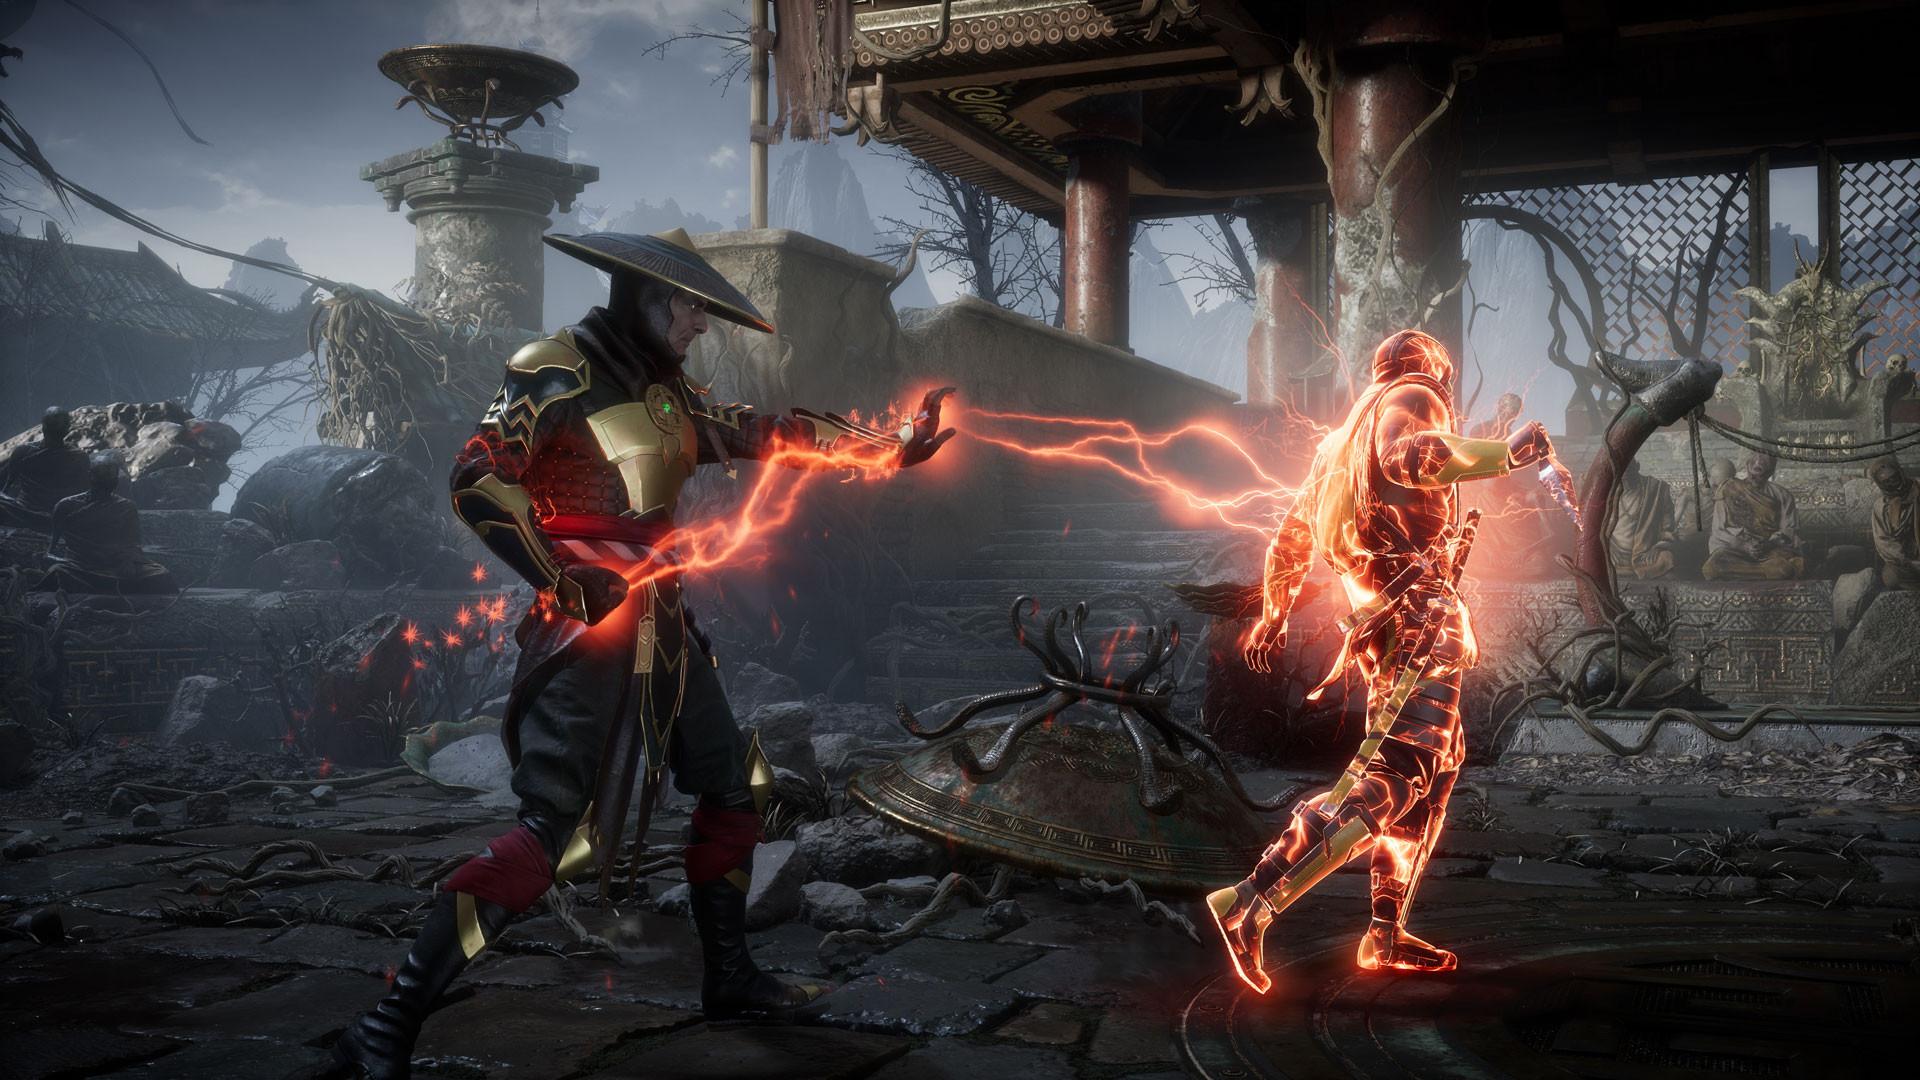 Mortal Kombat 11 анонсирована для PC, PS4, Xbox One и Switch